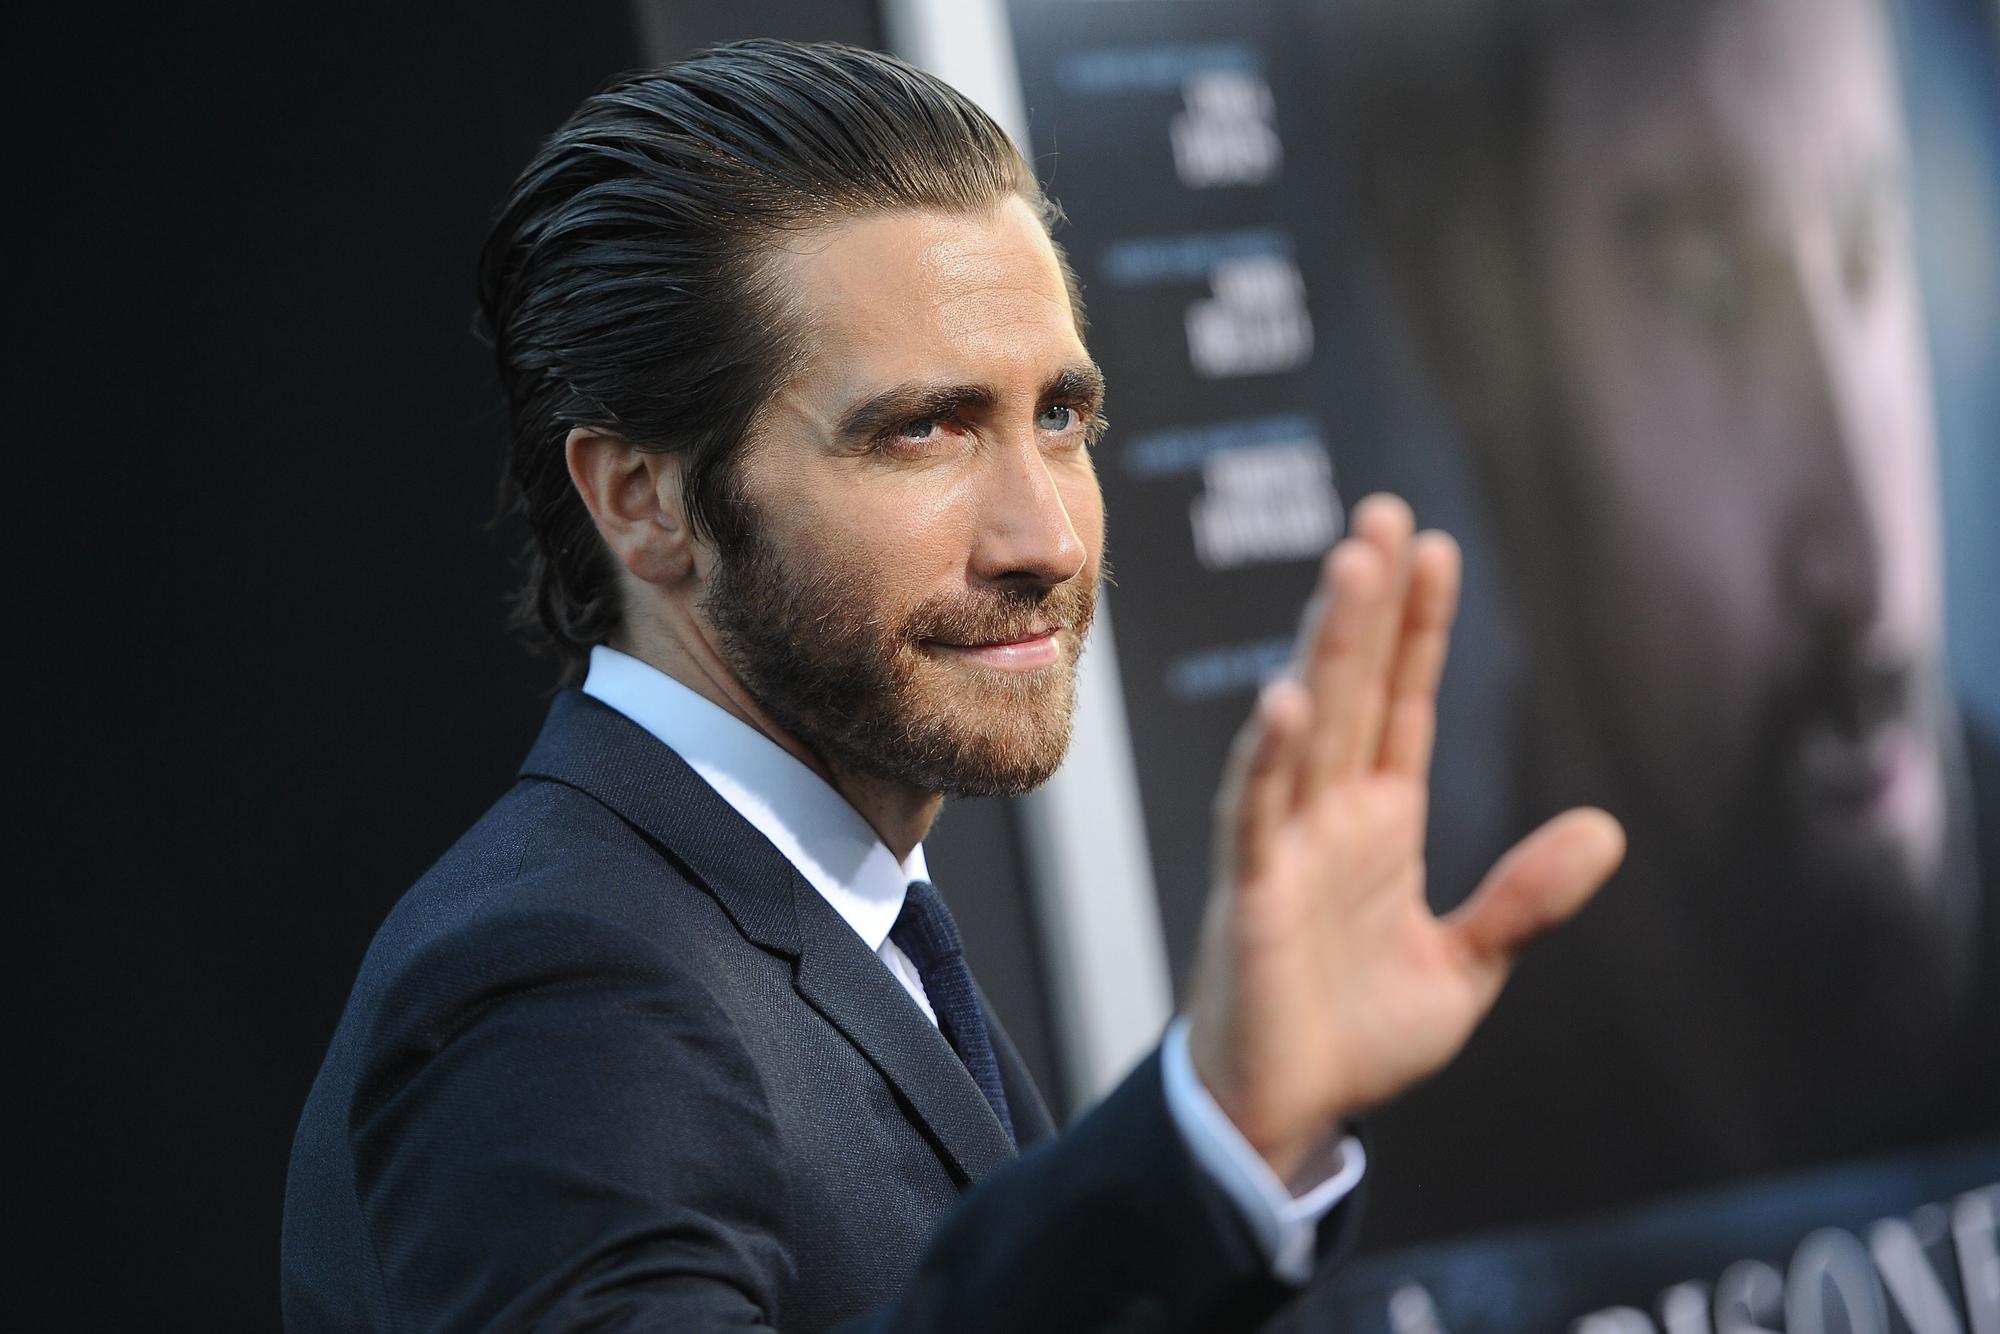 Jake Gyllenhaal Background